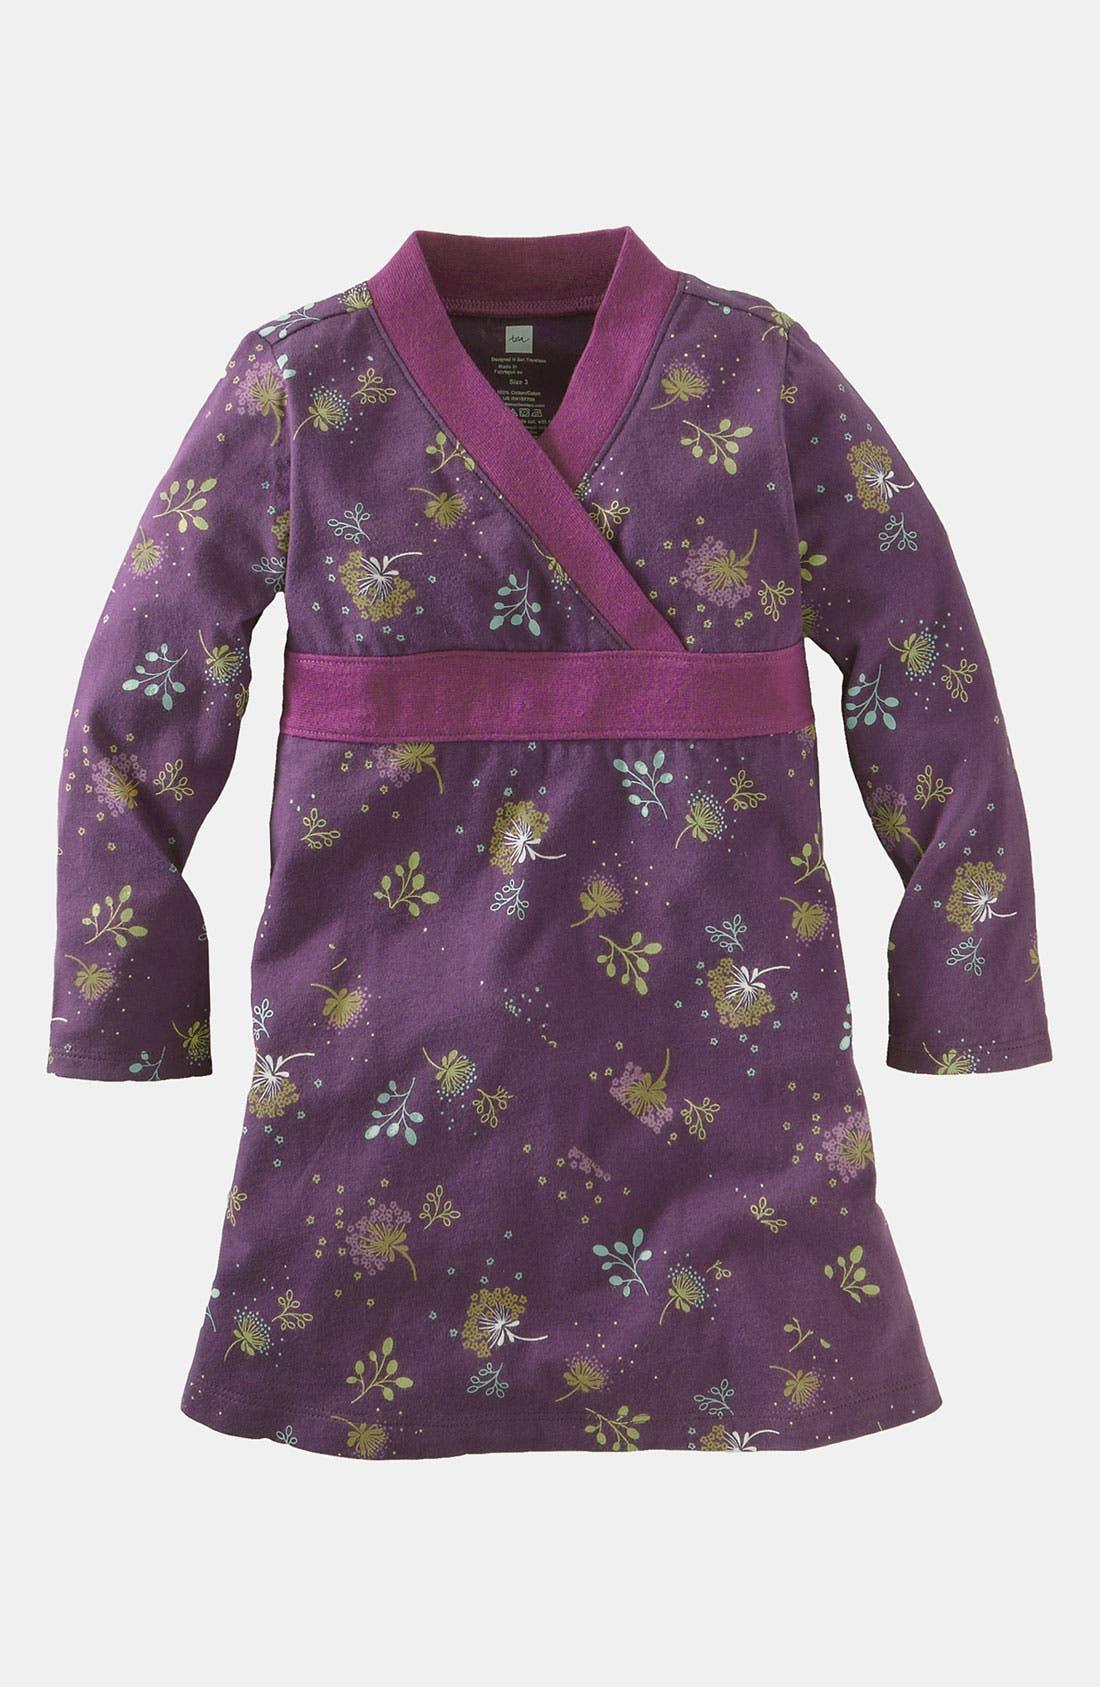 Alternate Image 1 Selected - Tea Collection 'Juniper' Wrap Dress (Infant)